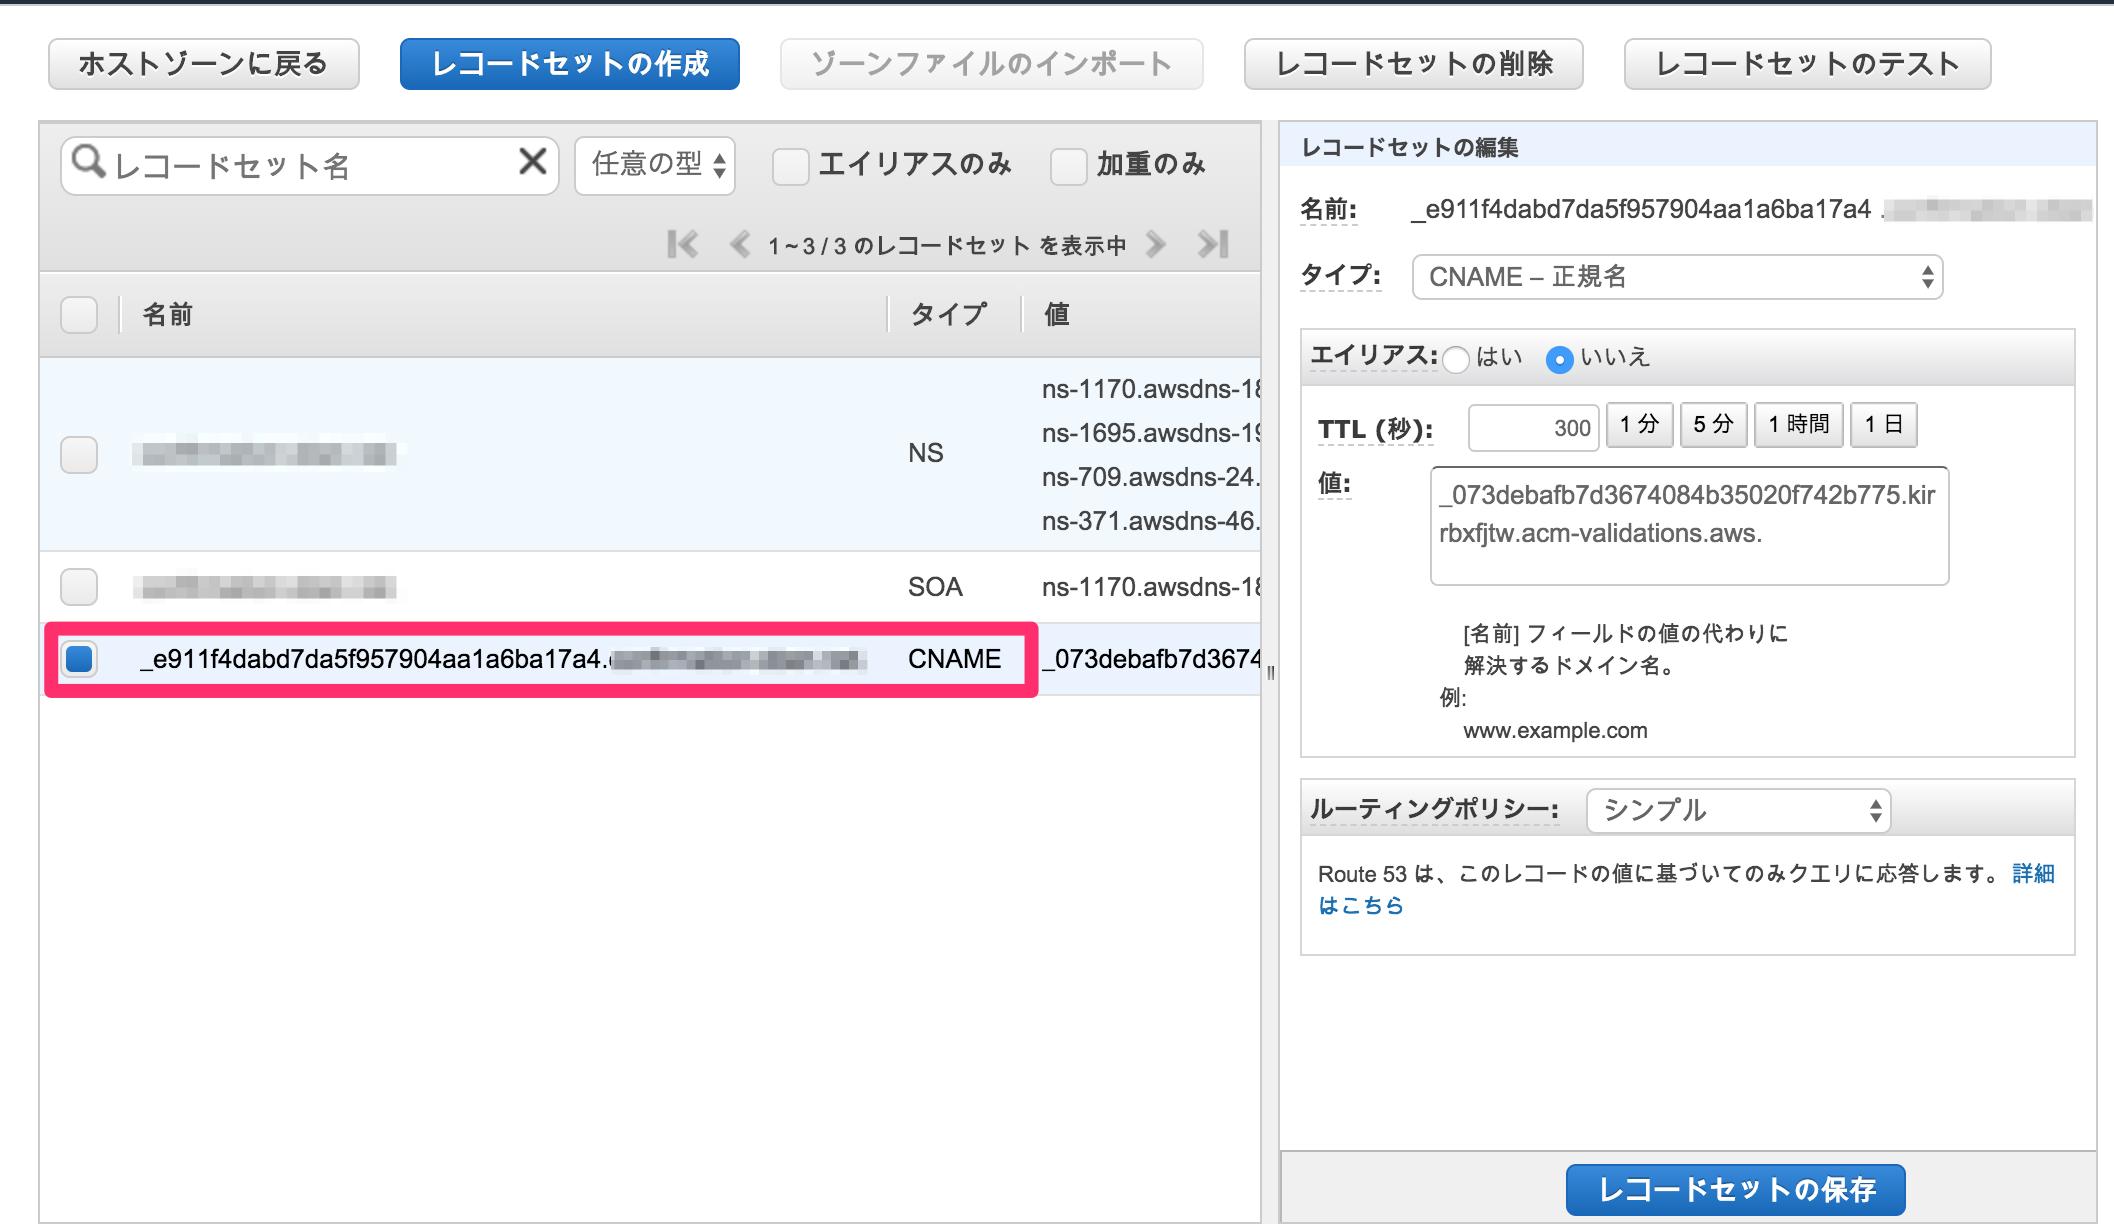 Route_53_Management_Console.png